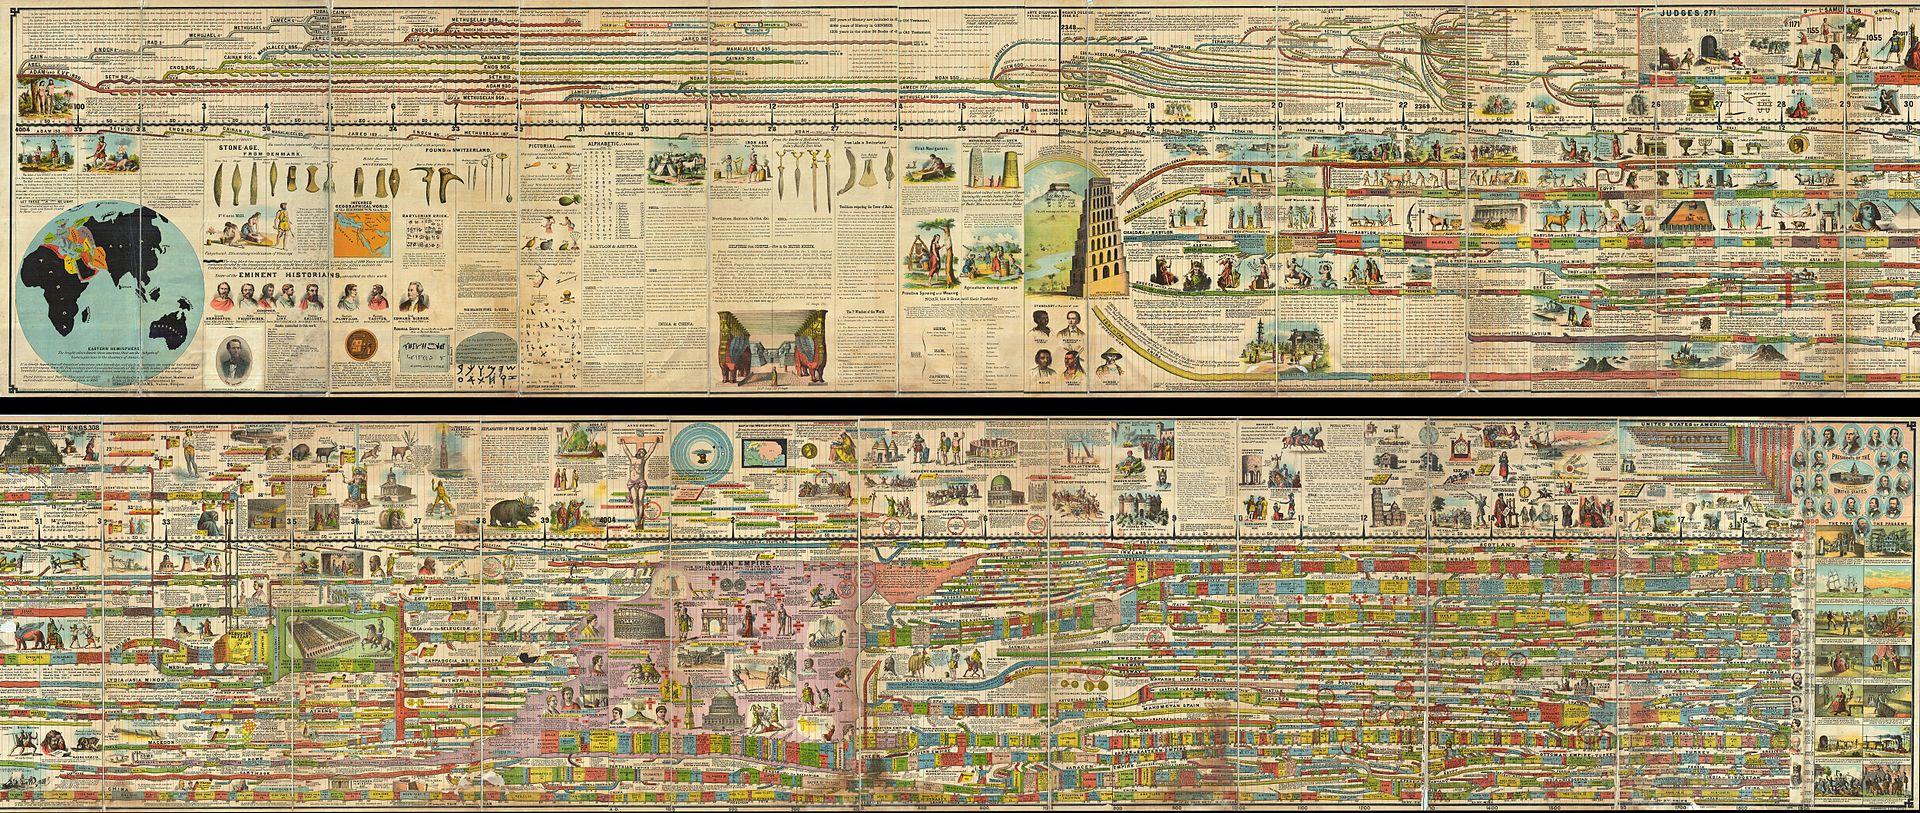 1878_Adams_Monumental_Illustrated_Panorama_of_History_-_Geographicus_-_WorldHistory-adams-1871